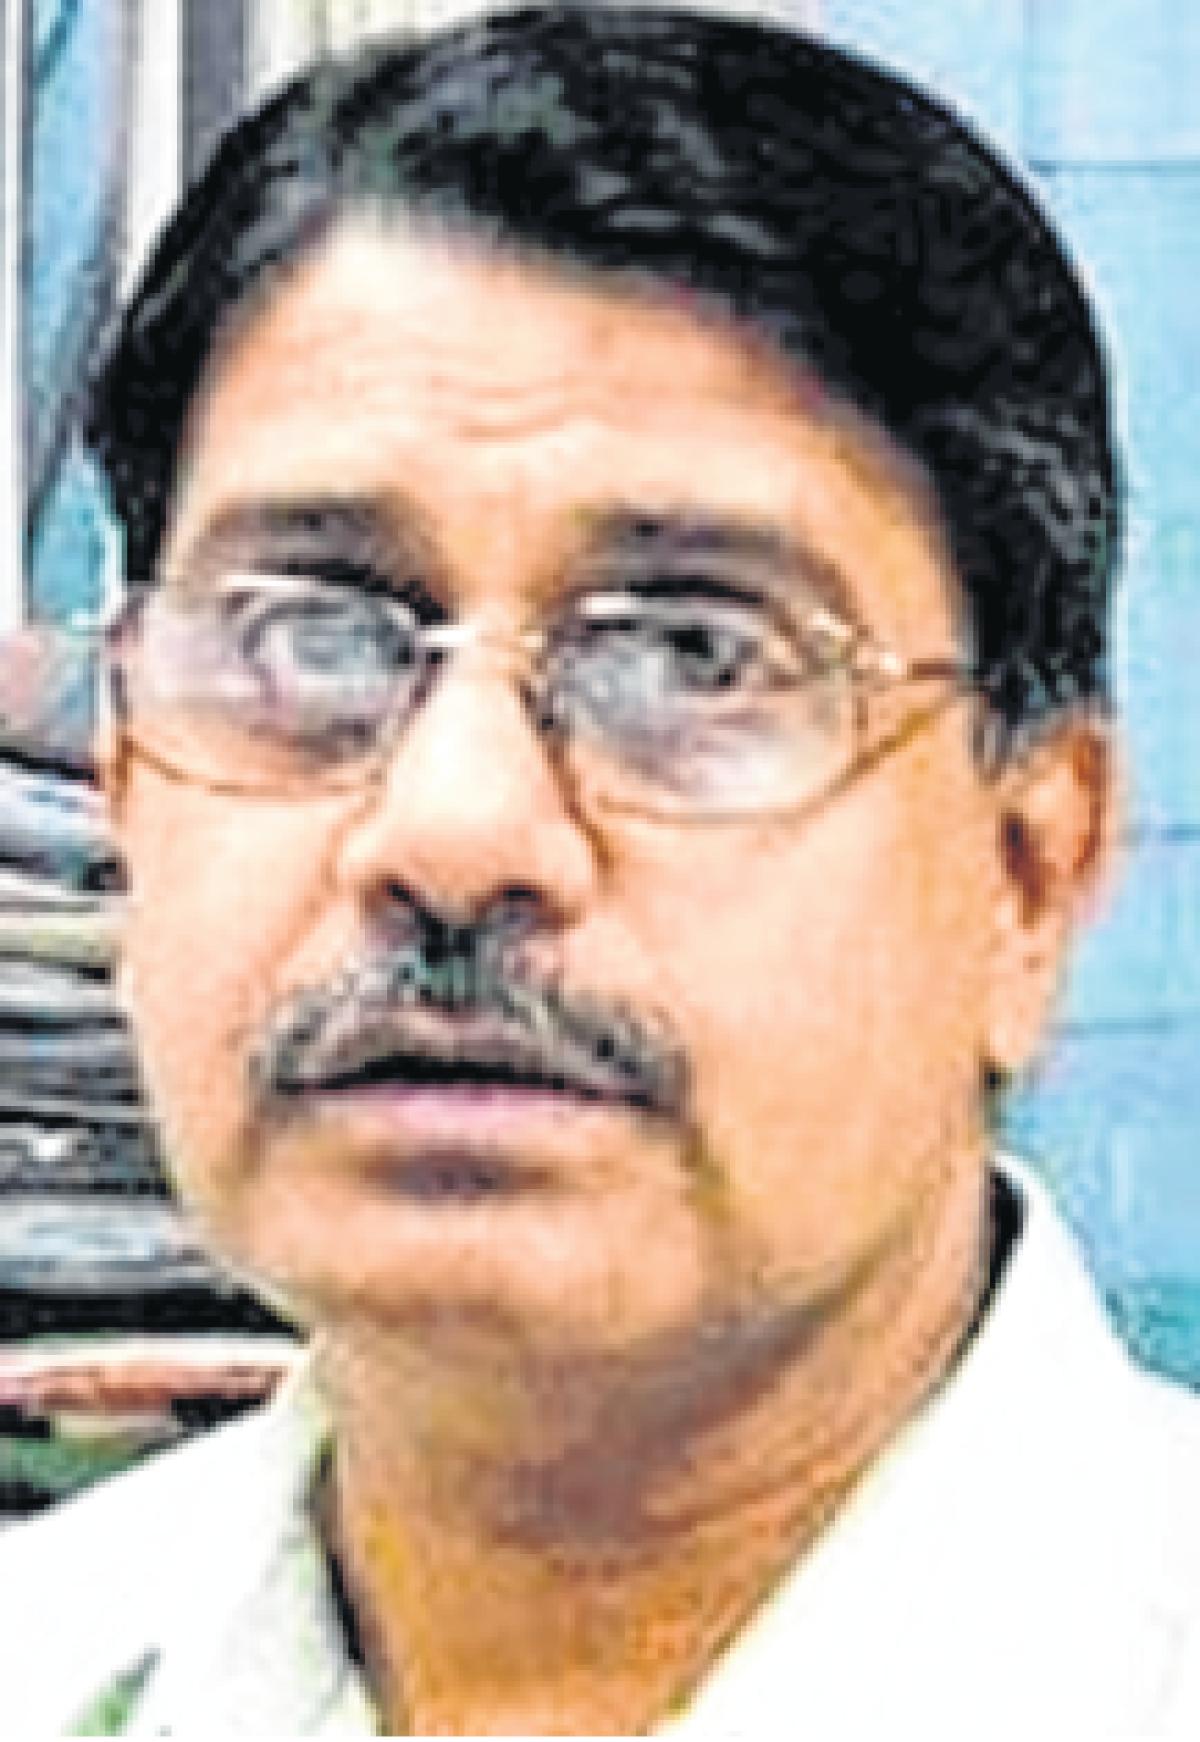 Bhopal: Journalism varsity VC Upasne resigns